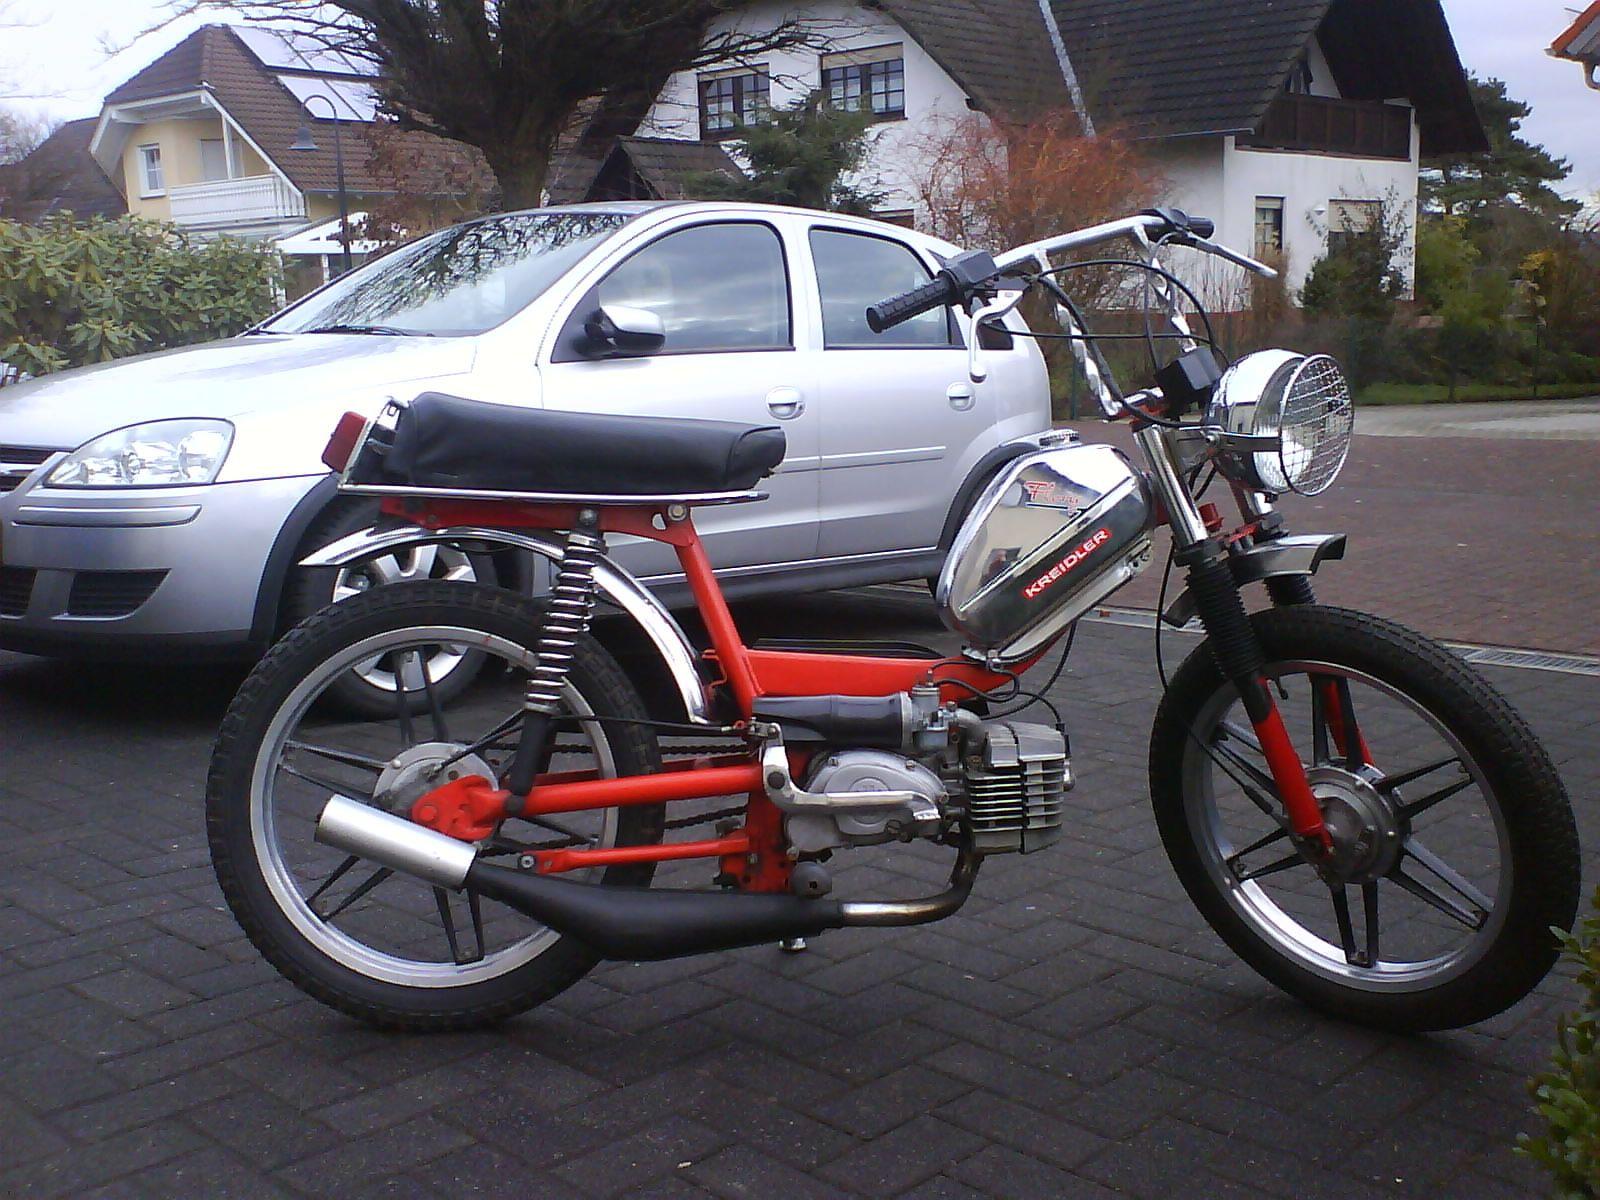 flory Cool Mopeds * Custom Mopeds * Shit-hot Mopeds